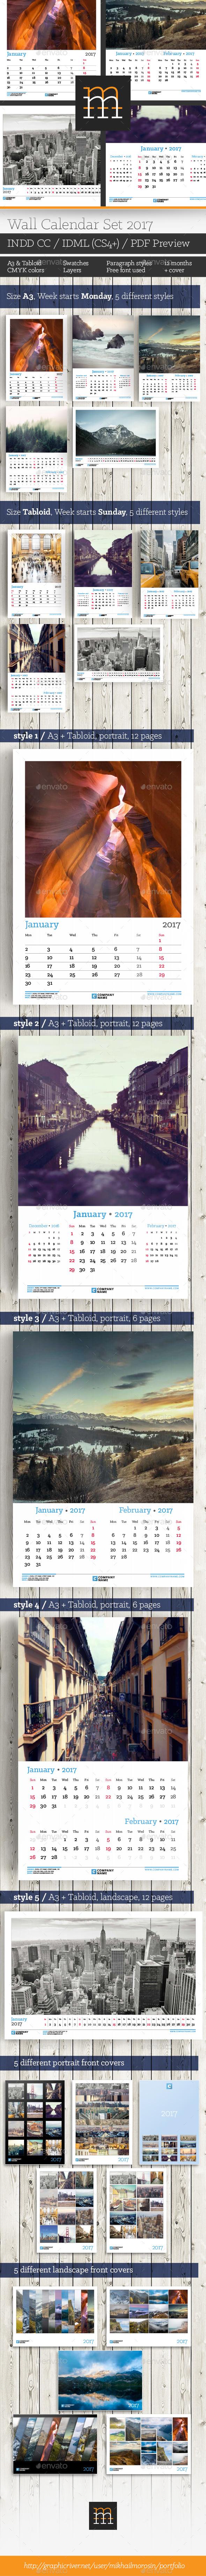 Wall Calendar Set 2017 - Calendars Stationery